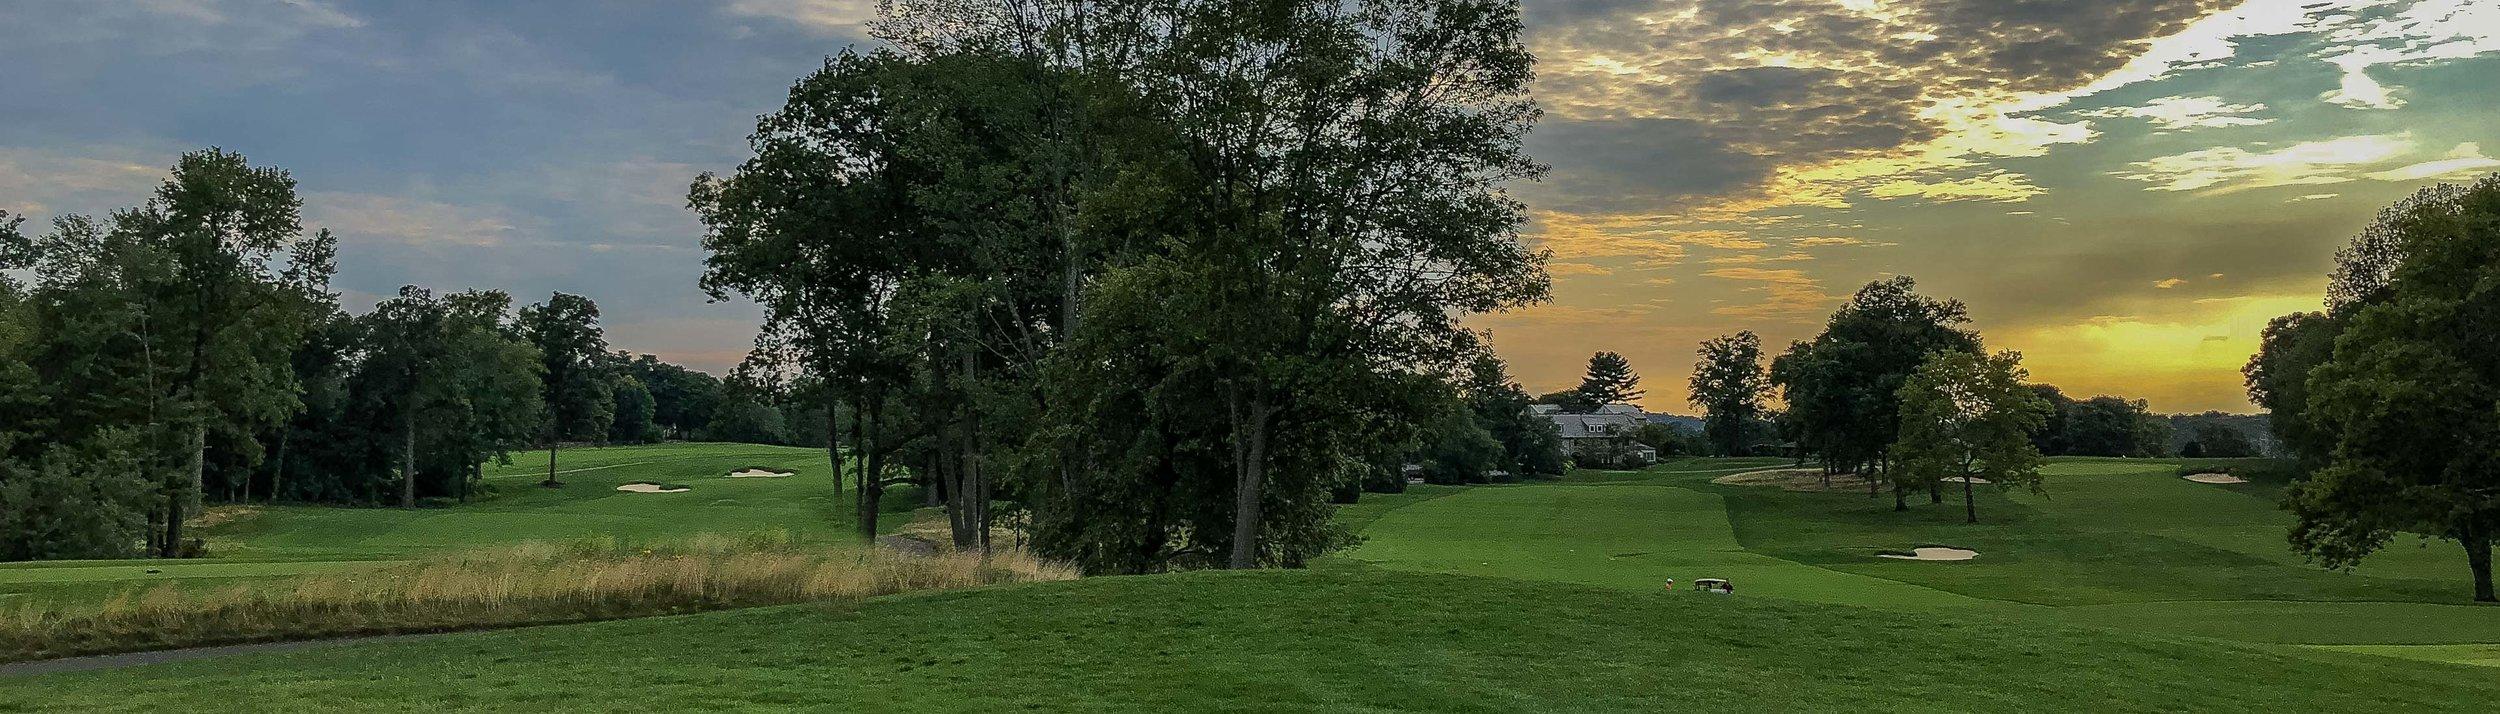 SCC 2018 Golf #18 & 1- HAP (4 of 7).jpg